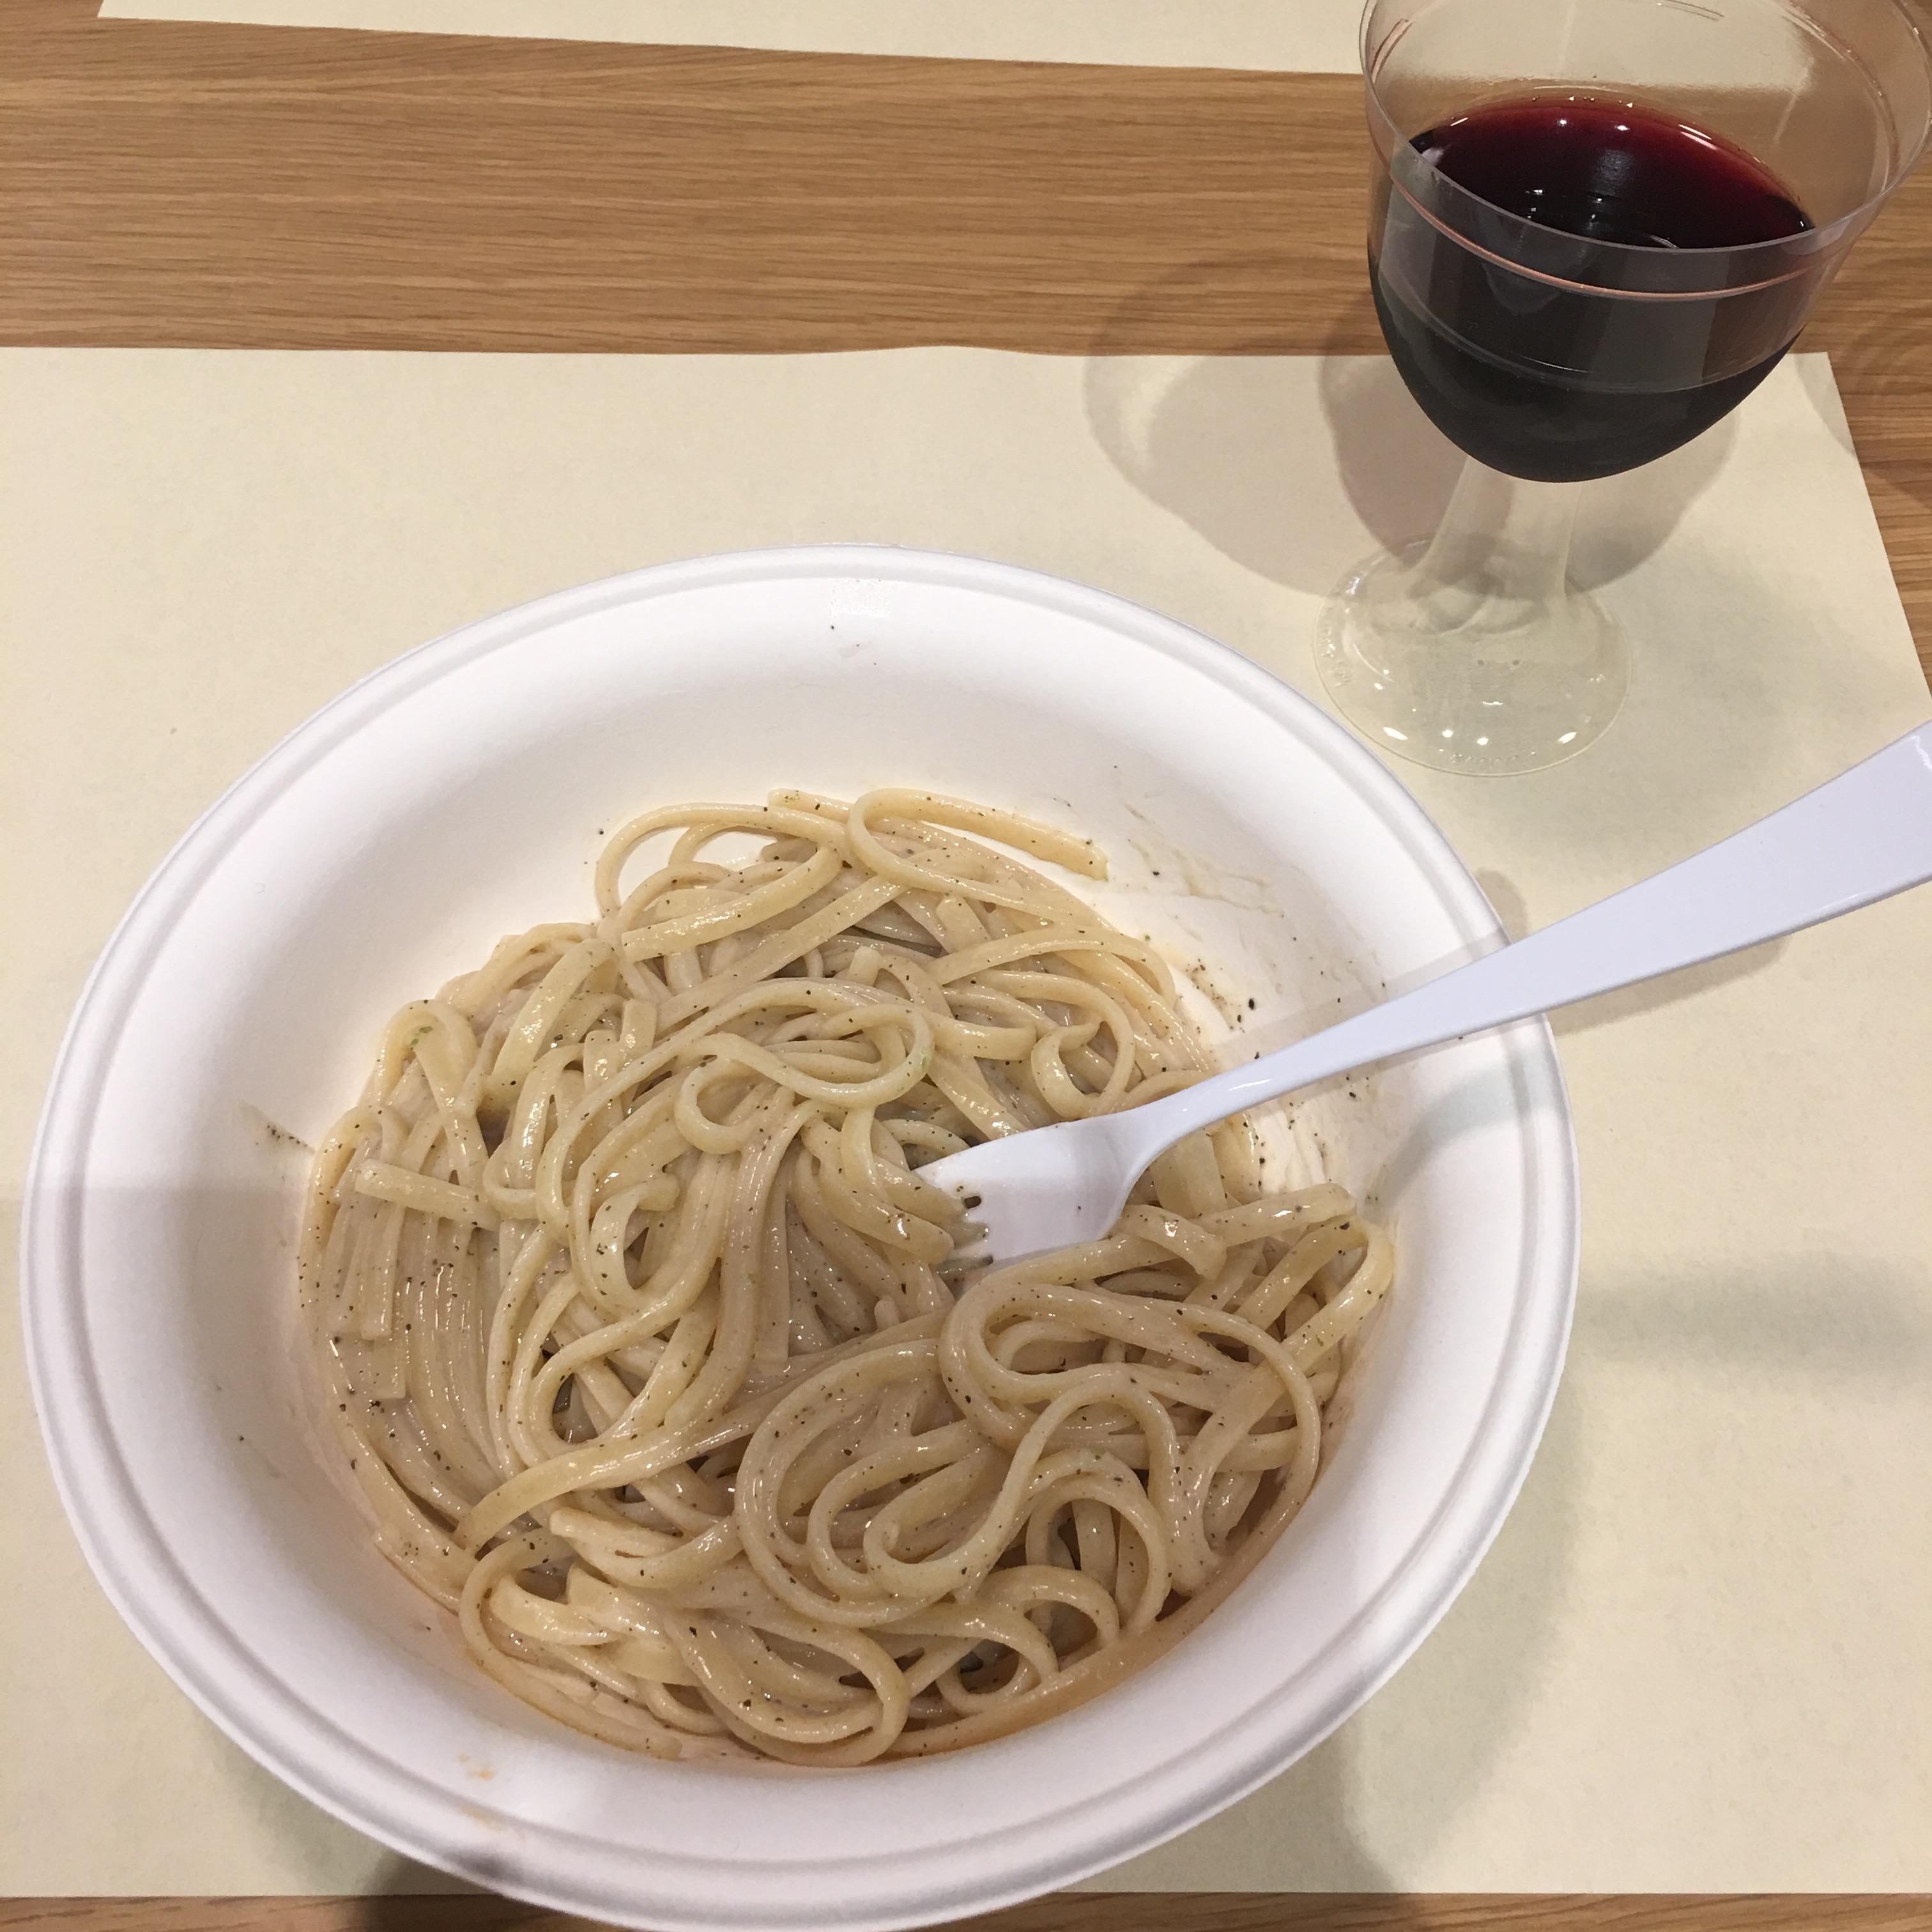 Fico World Eataly Bologna